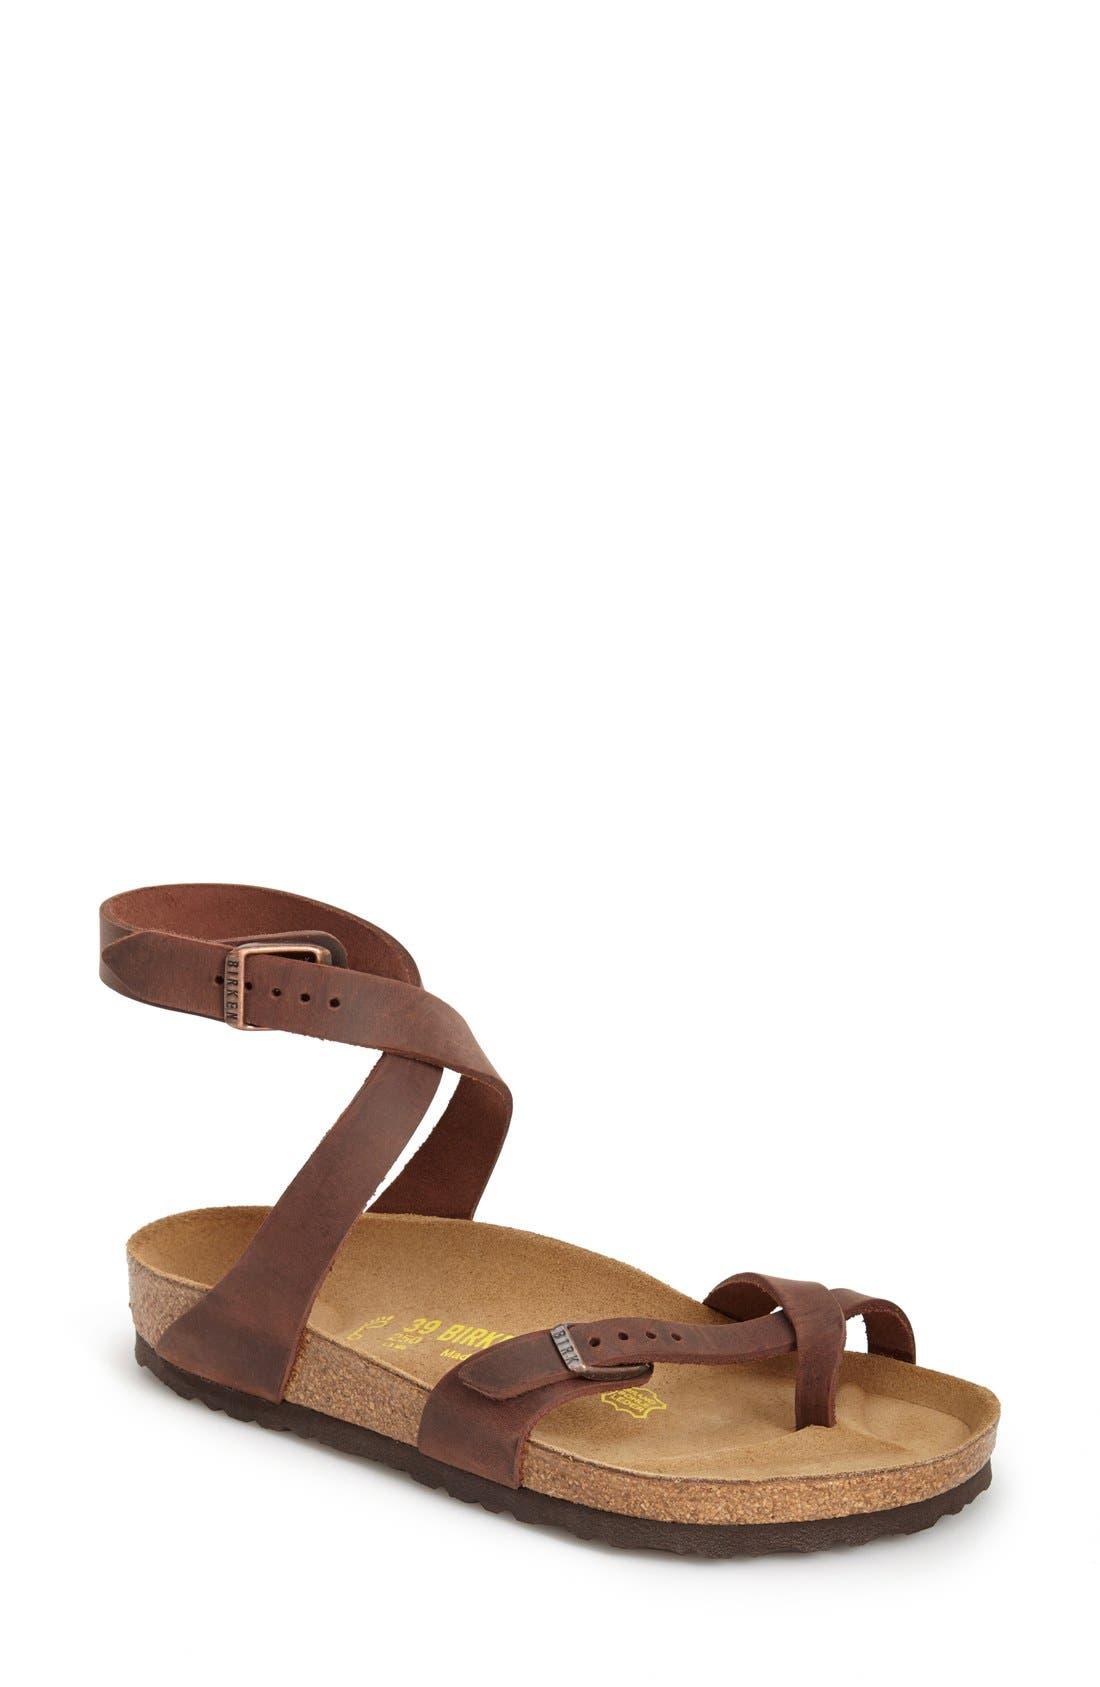 'Yara' Sandal,                         Main,                         color, Yara Habana Oiled Leather